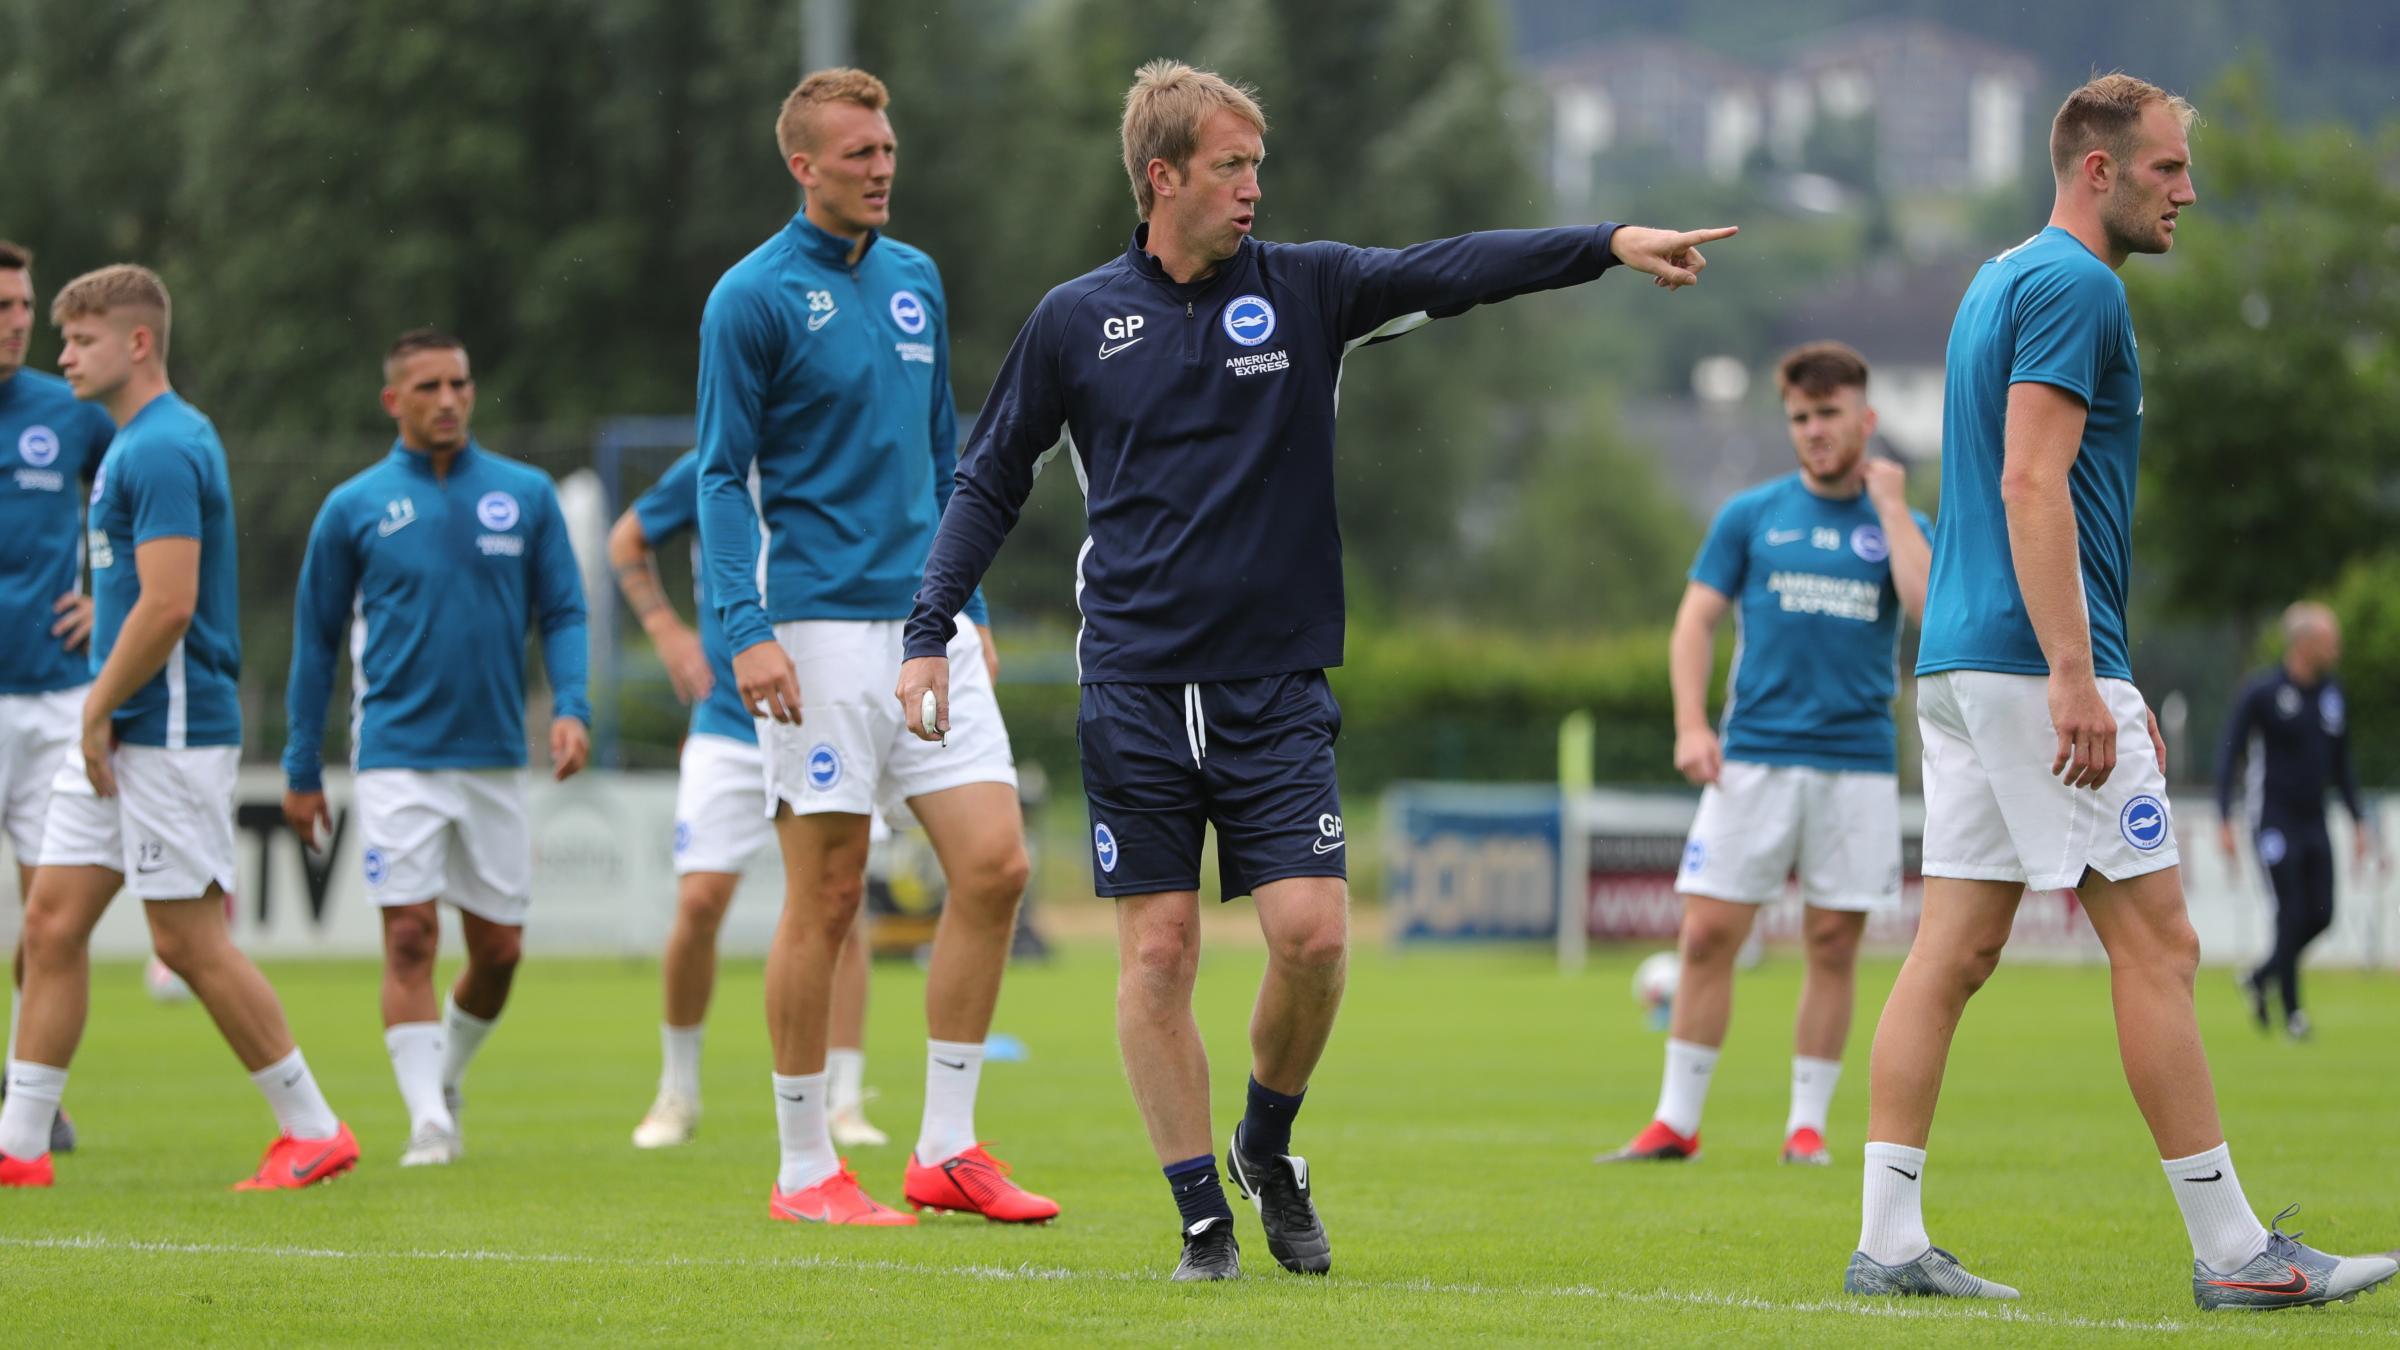 Albion head coach happy with the progress on pre-season trip